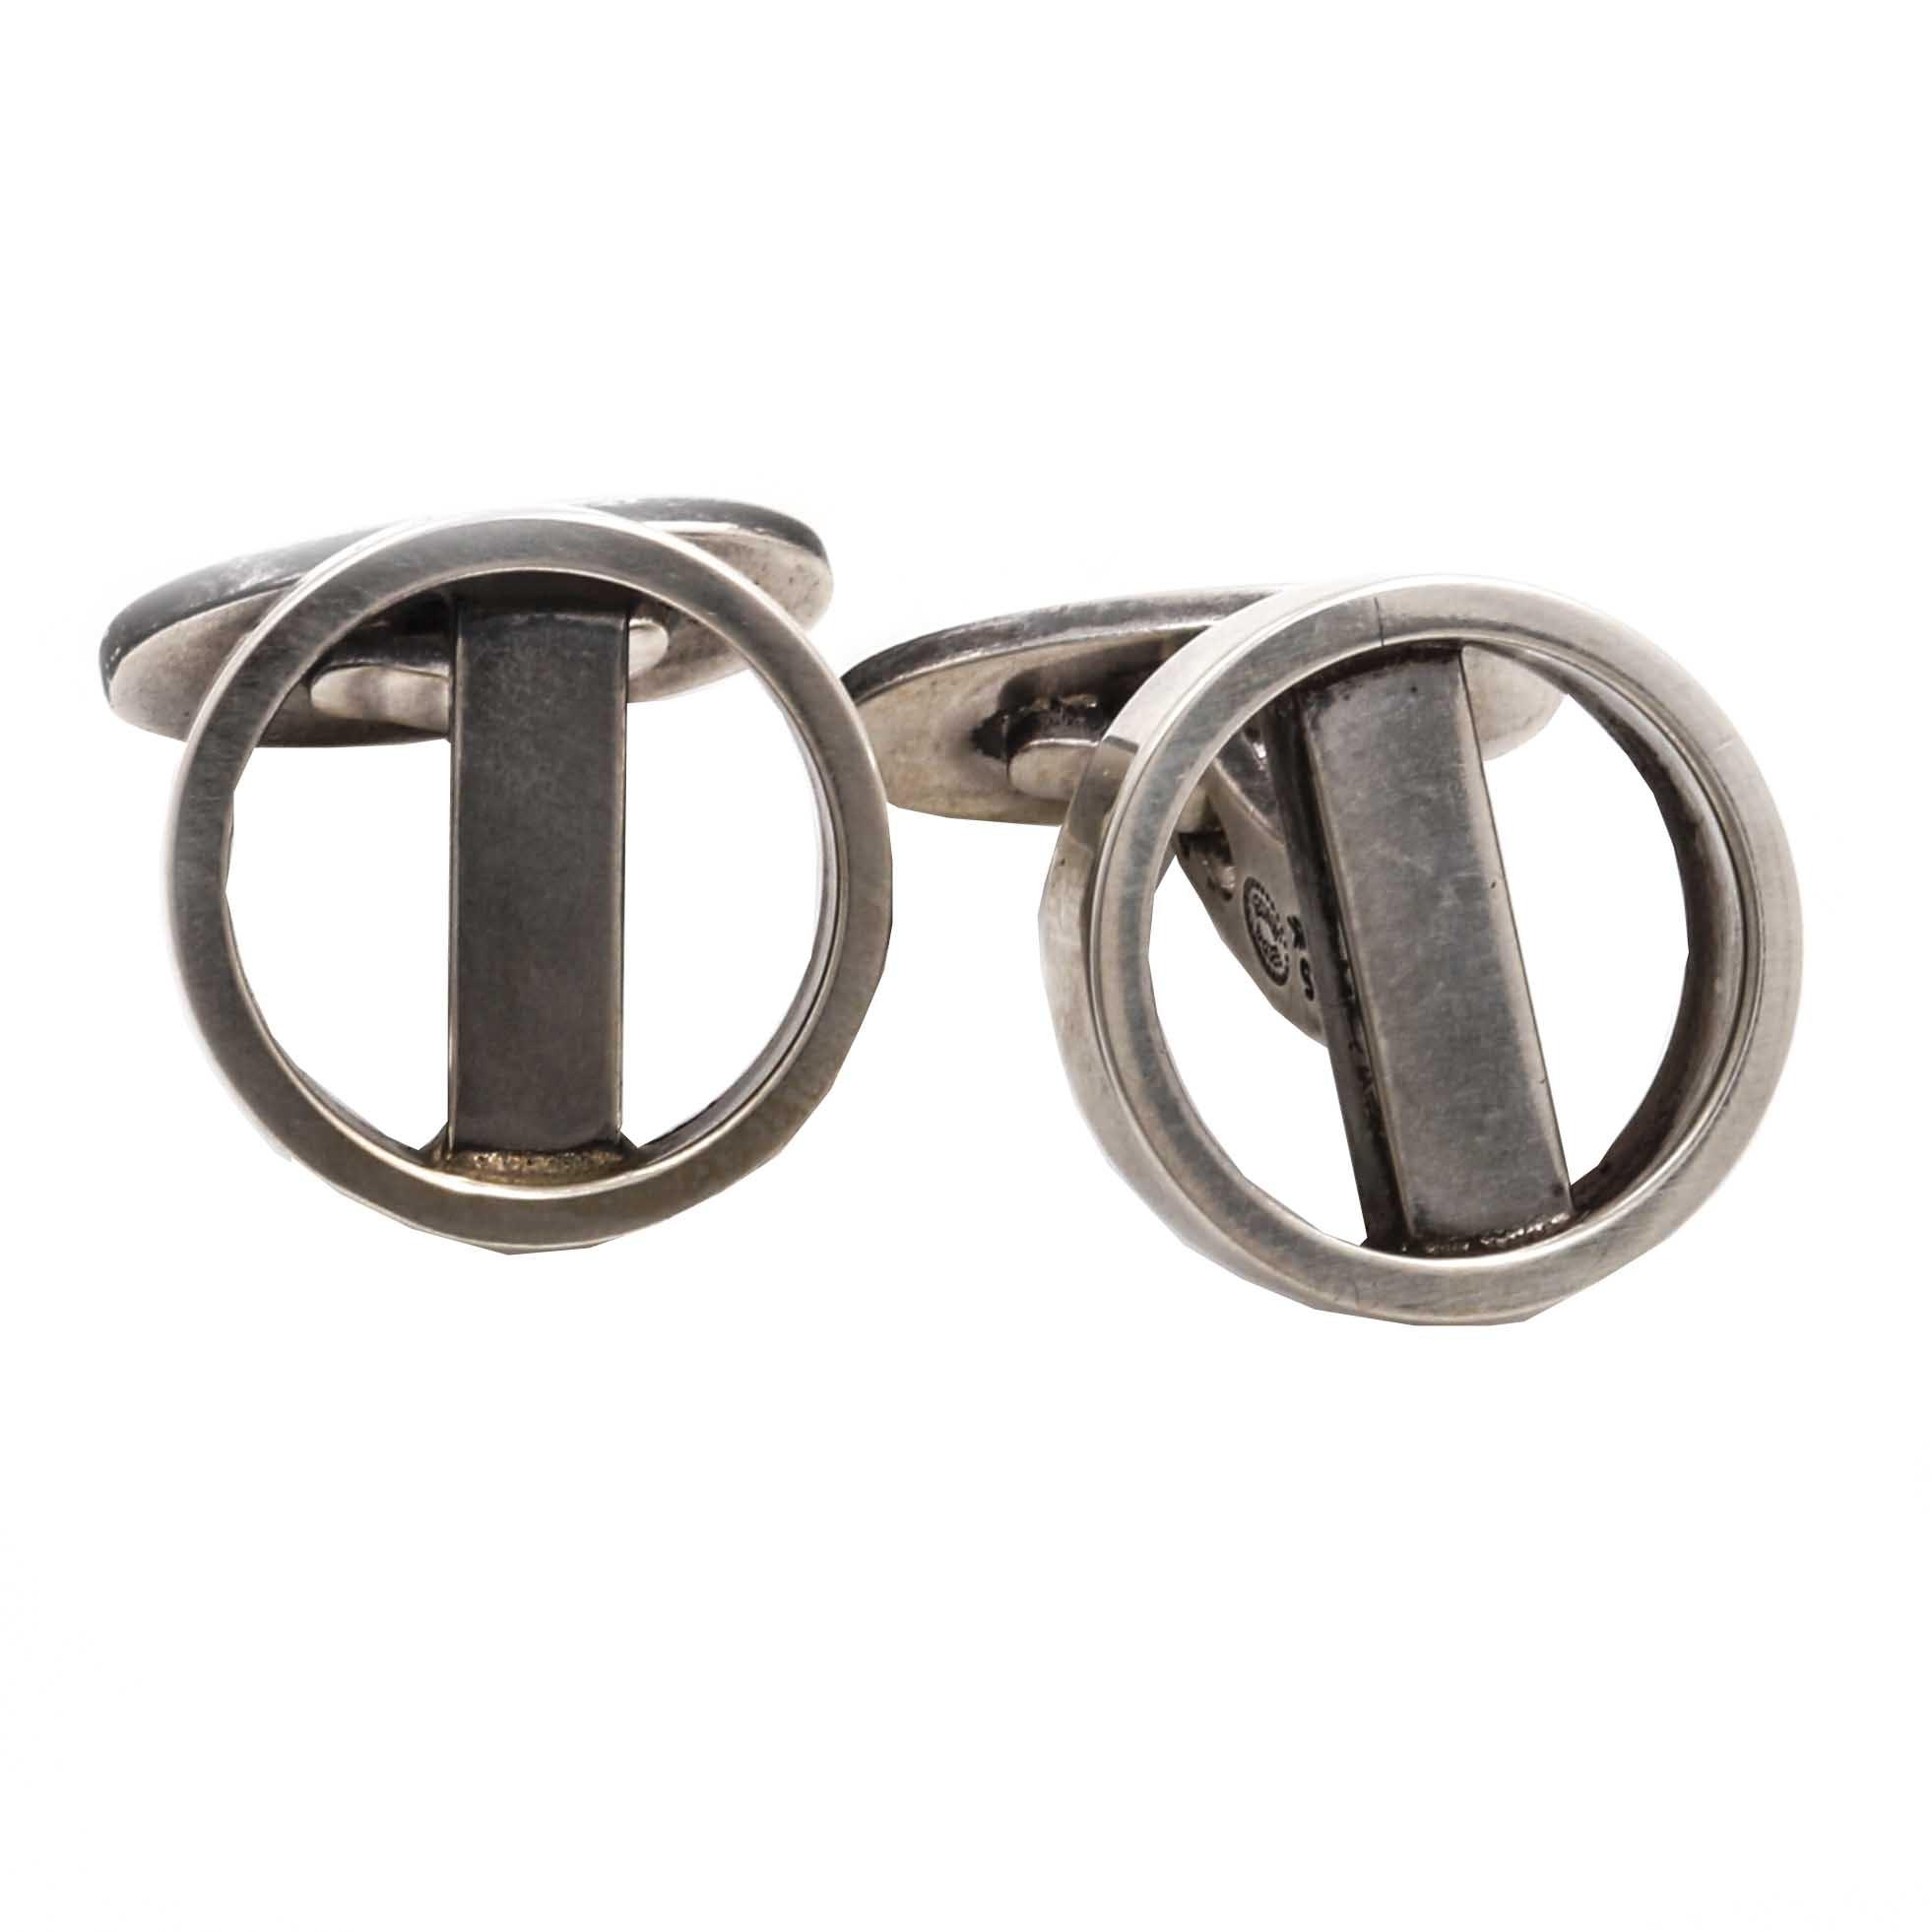 Circa 1915-1919 Georg Jensen Danish Sterling Silver #91 Modernist Cufflinks